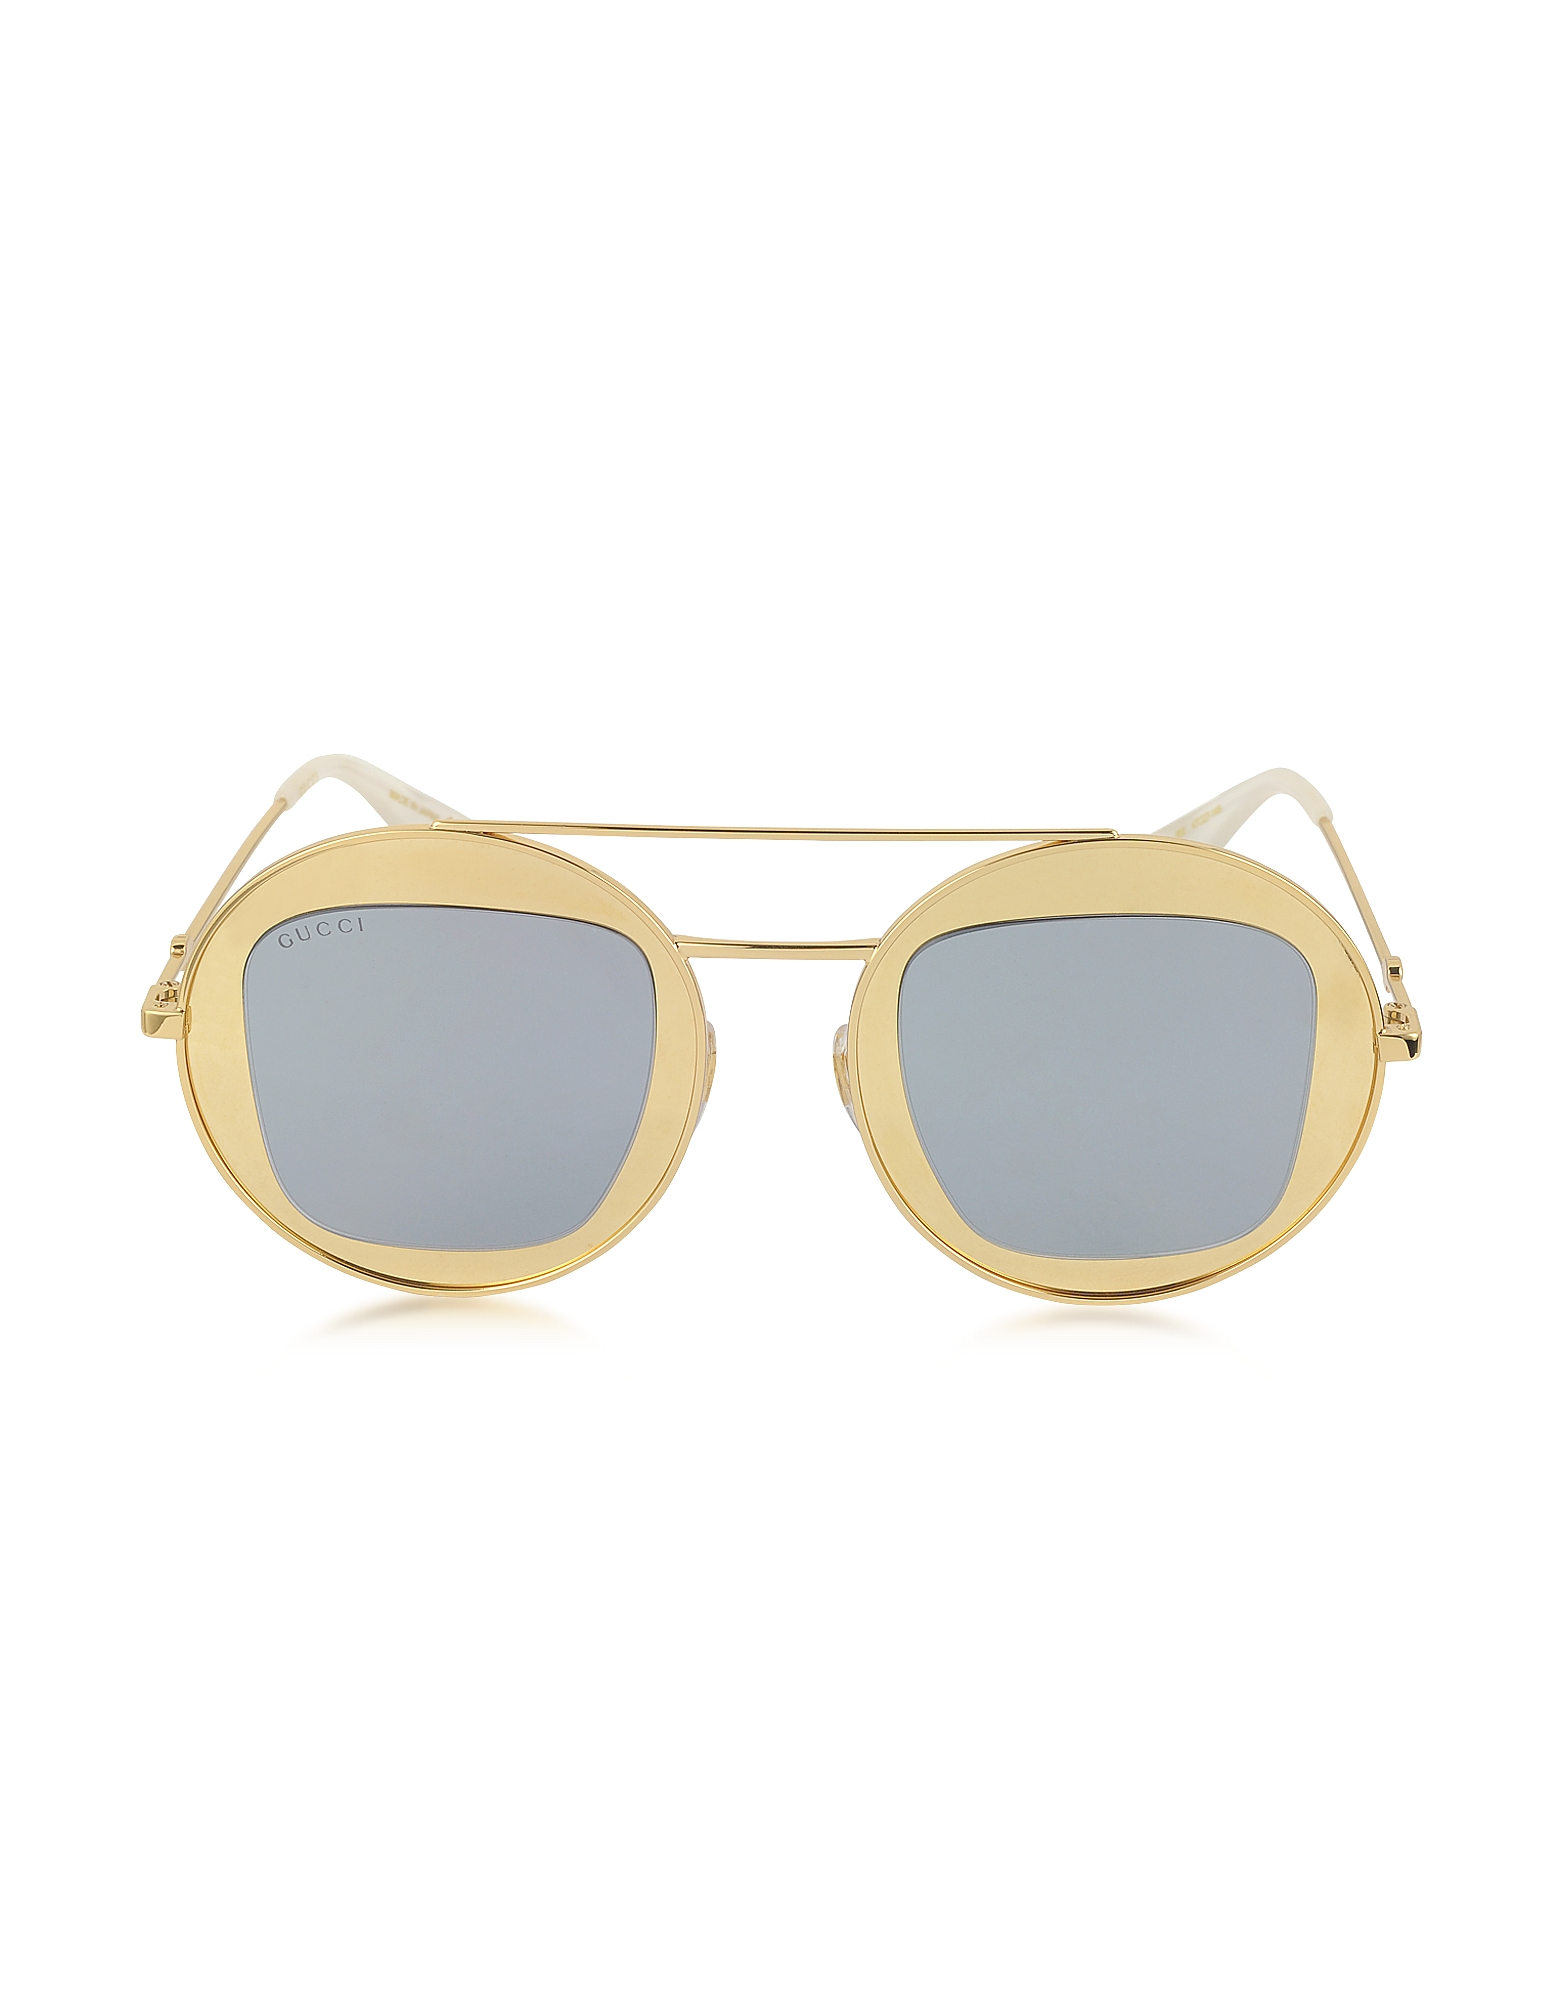 Gucci Designer Sunglasses, GG0105S Metal Round Aviator Women's Sunglasses